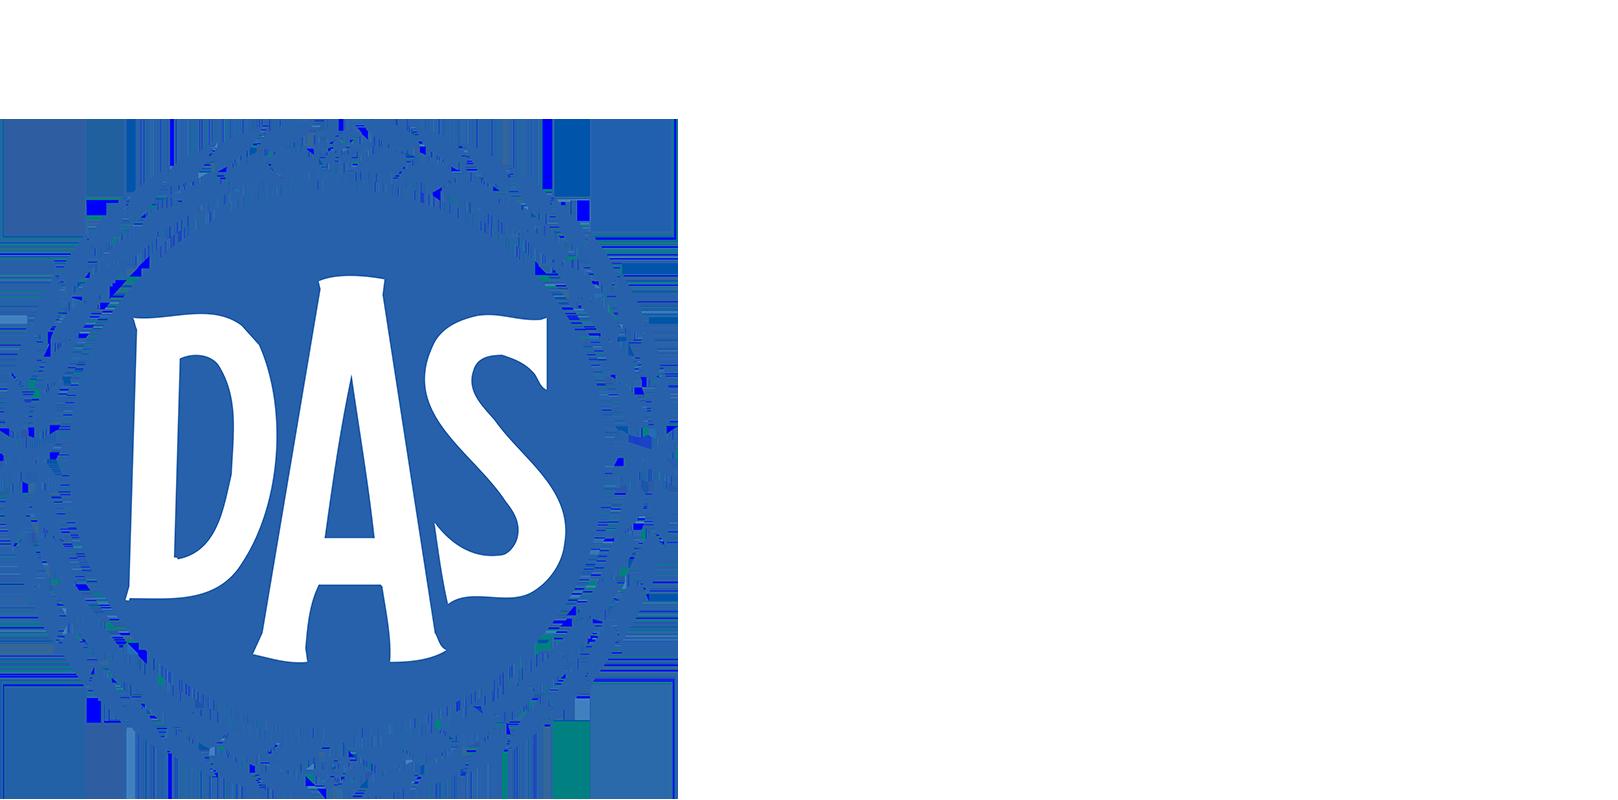 https://overwater-volmacht.nl/wp-content/uploads/2020/03/logo-das-1.png